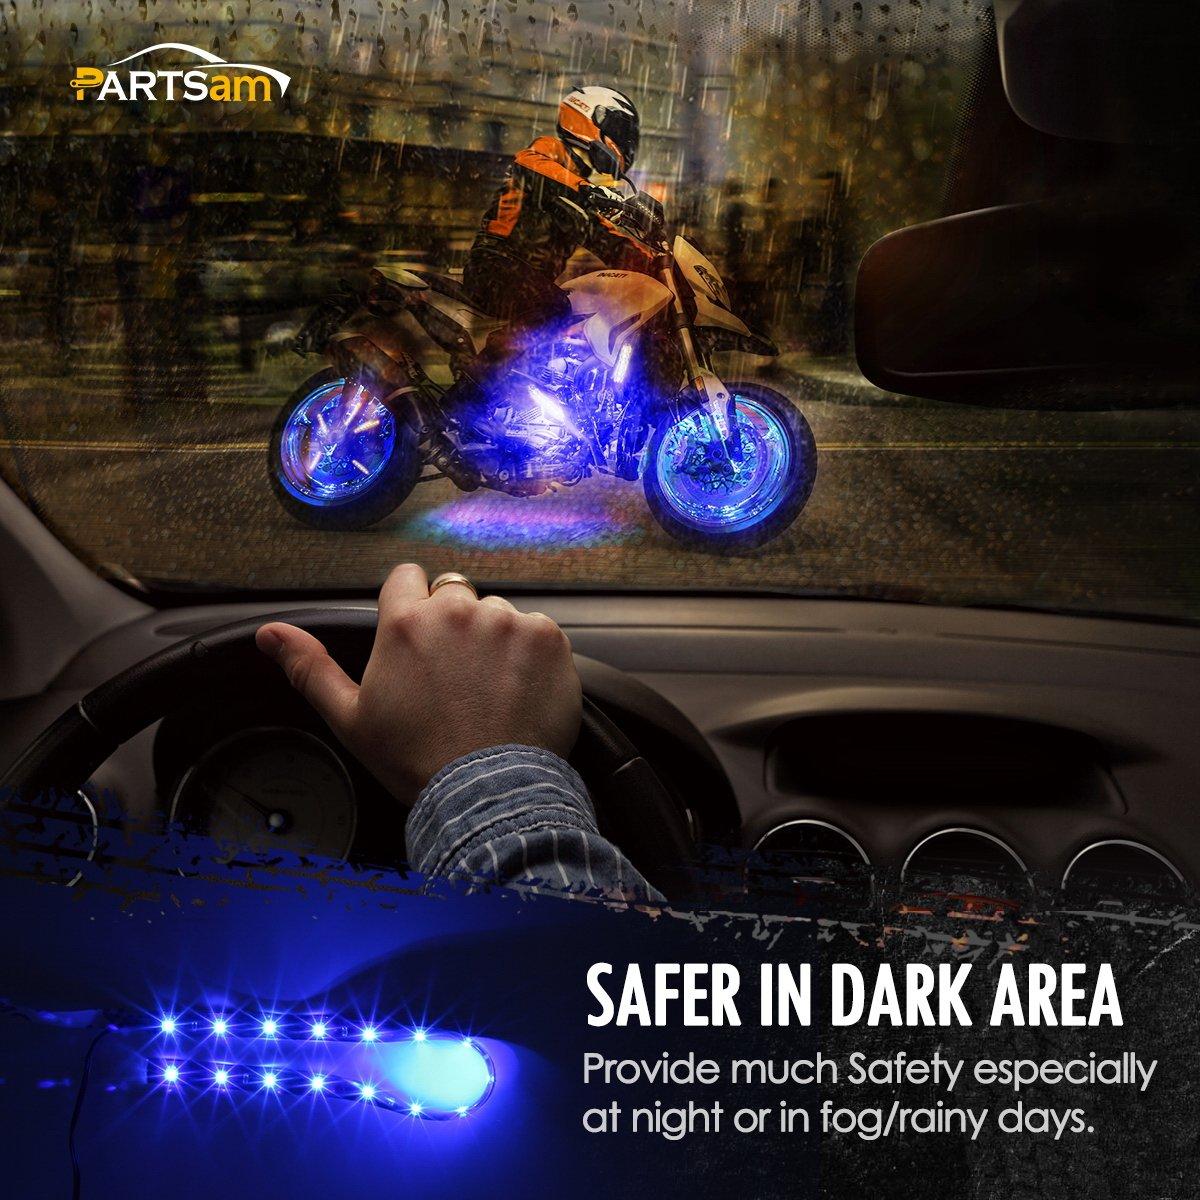 Partsam 2PCS Blue LED Strip Lights Interior Under Dash Floor Light for Cars Trucks Pickup 12 15-3528-SMD Glow Neon Lighting Side footwells Light